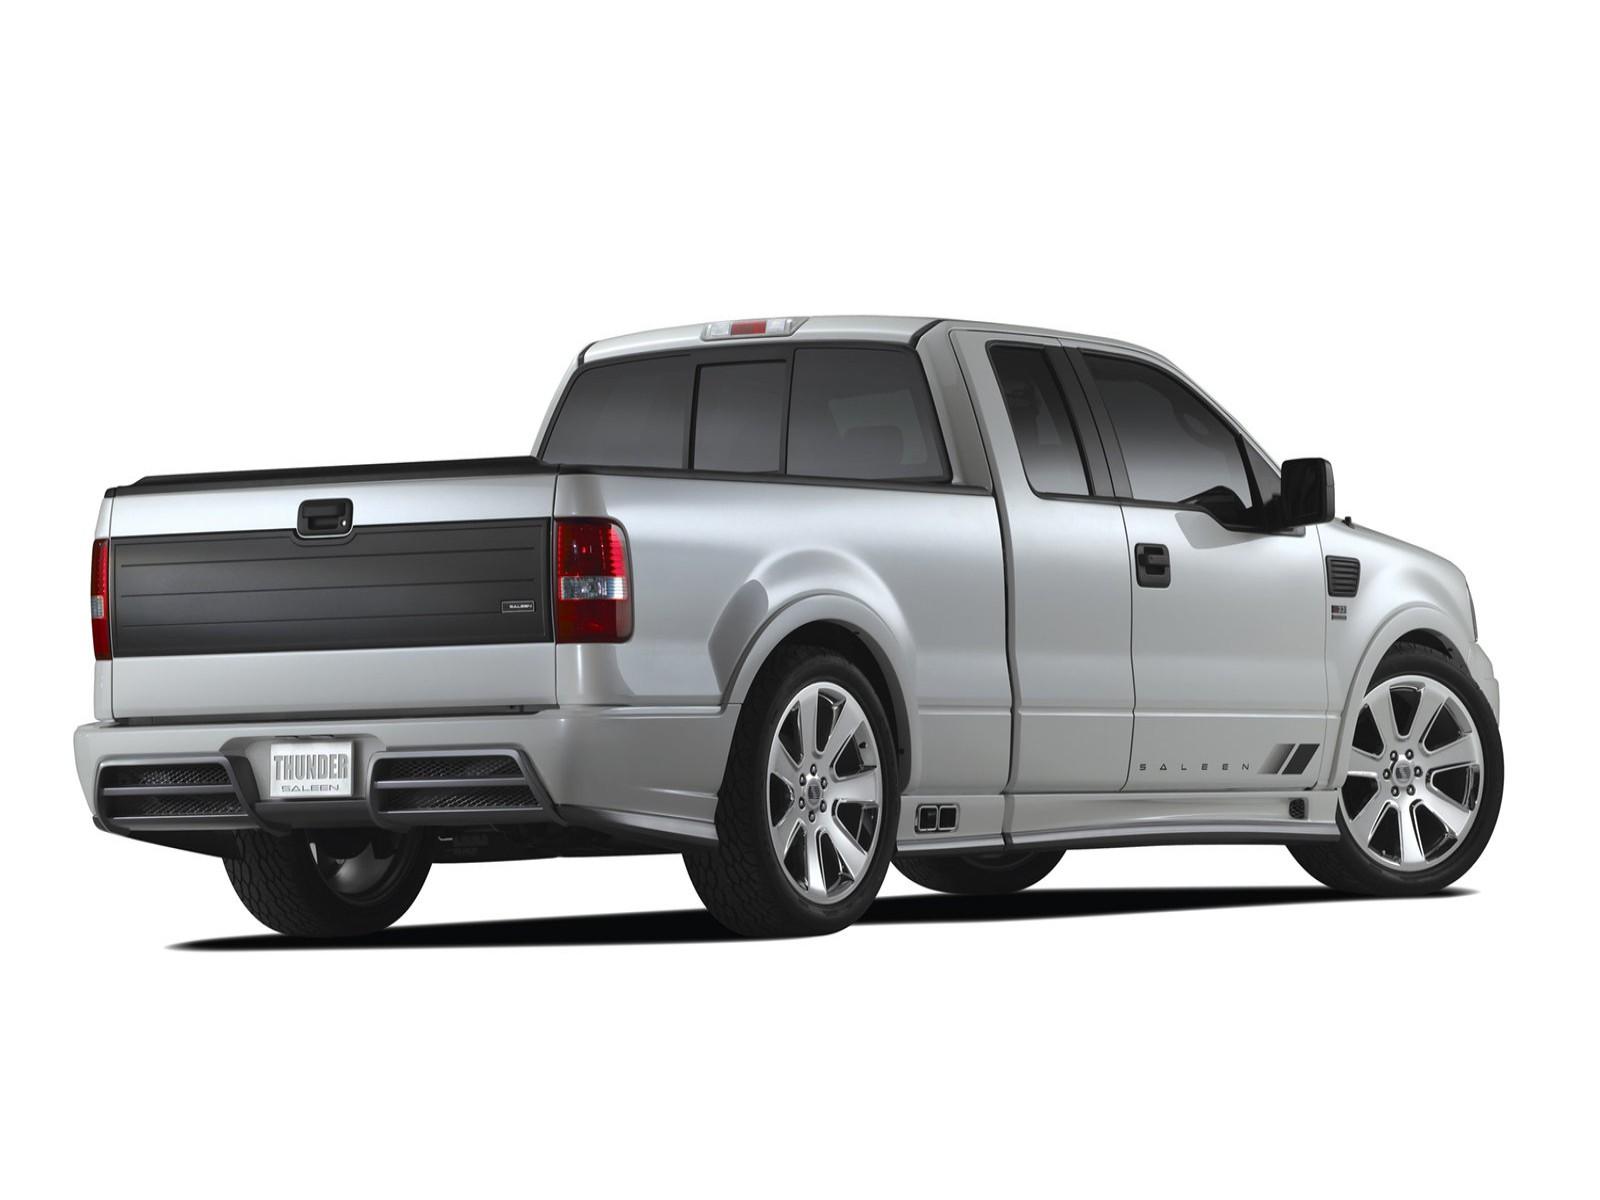 car pictures saleen ford f 150 s331 sport truck 2006. Black Bedroom Furniture Sets. Home Design Ideas